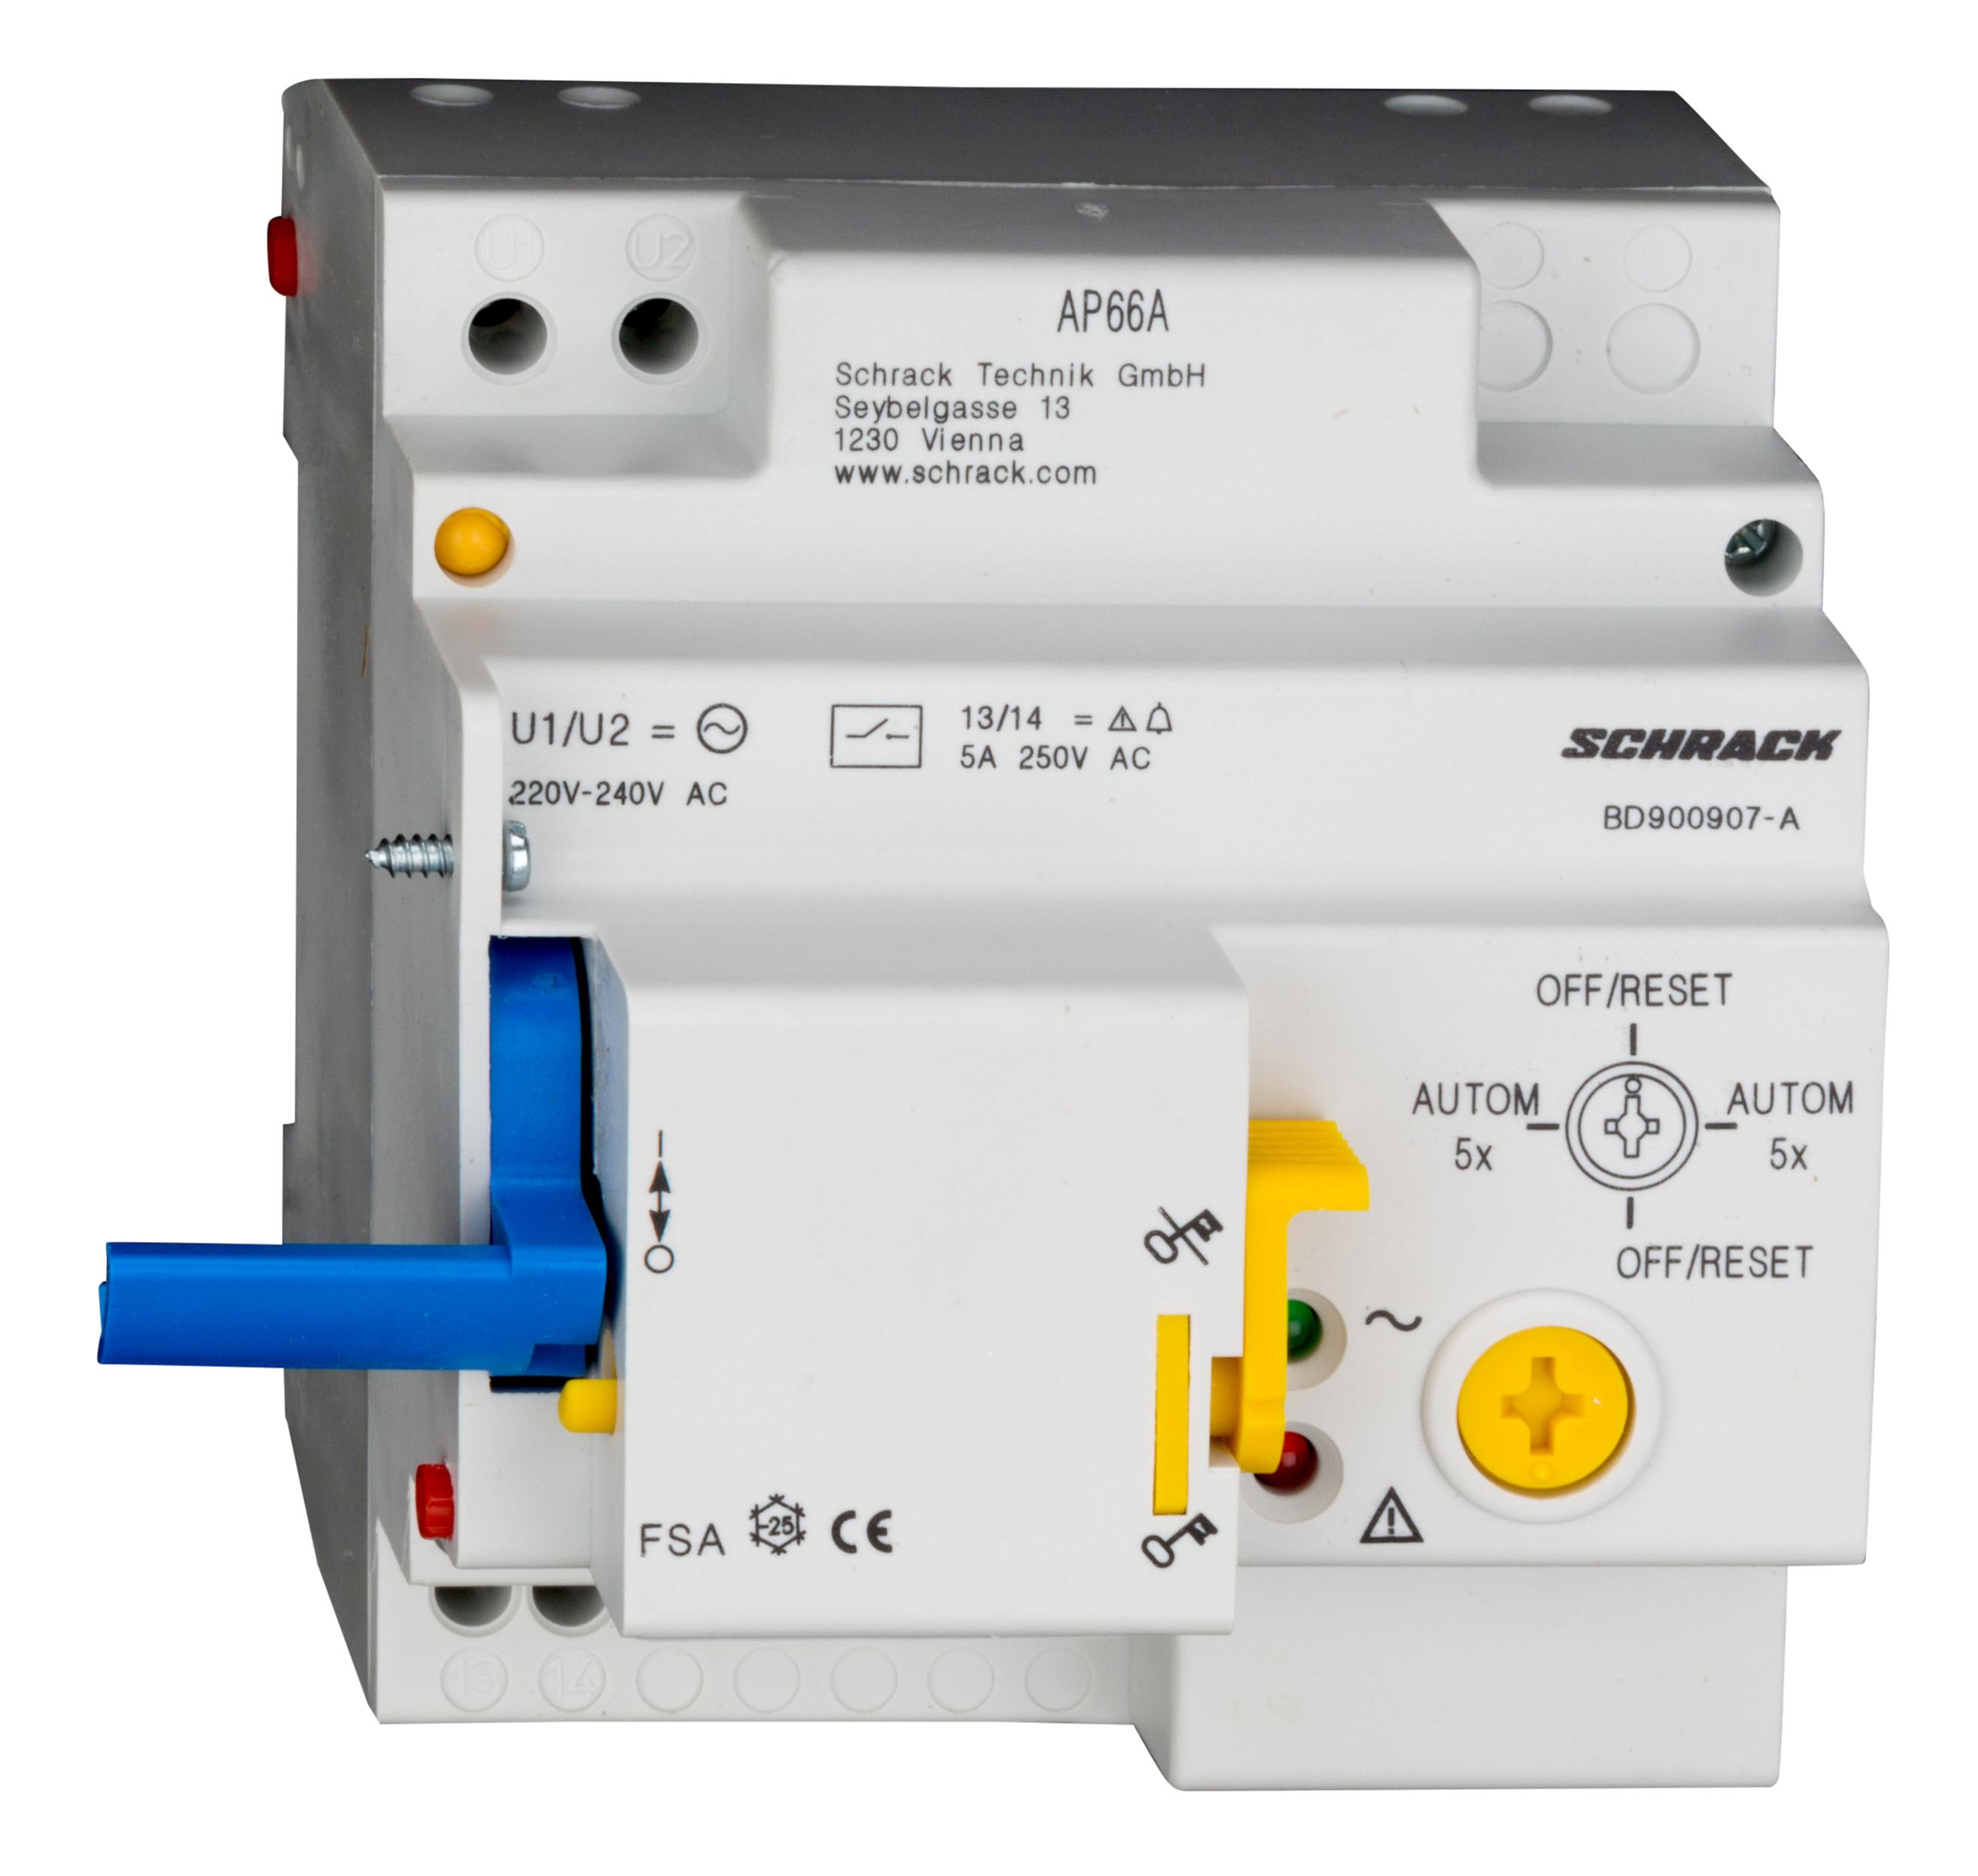 Remote Switching Unit 230v Ac Type Fsa Online Shop Schrack Knx Lighting Wiring Diagram Technik International